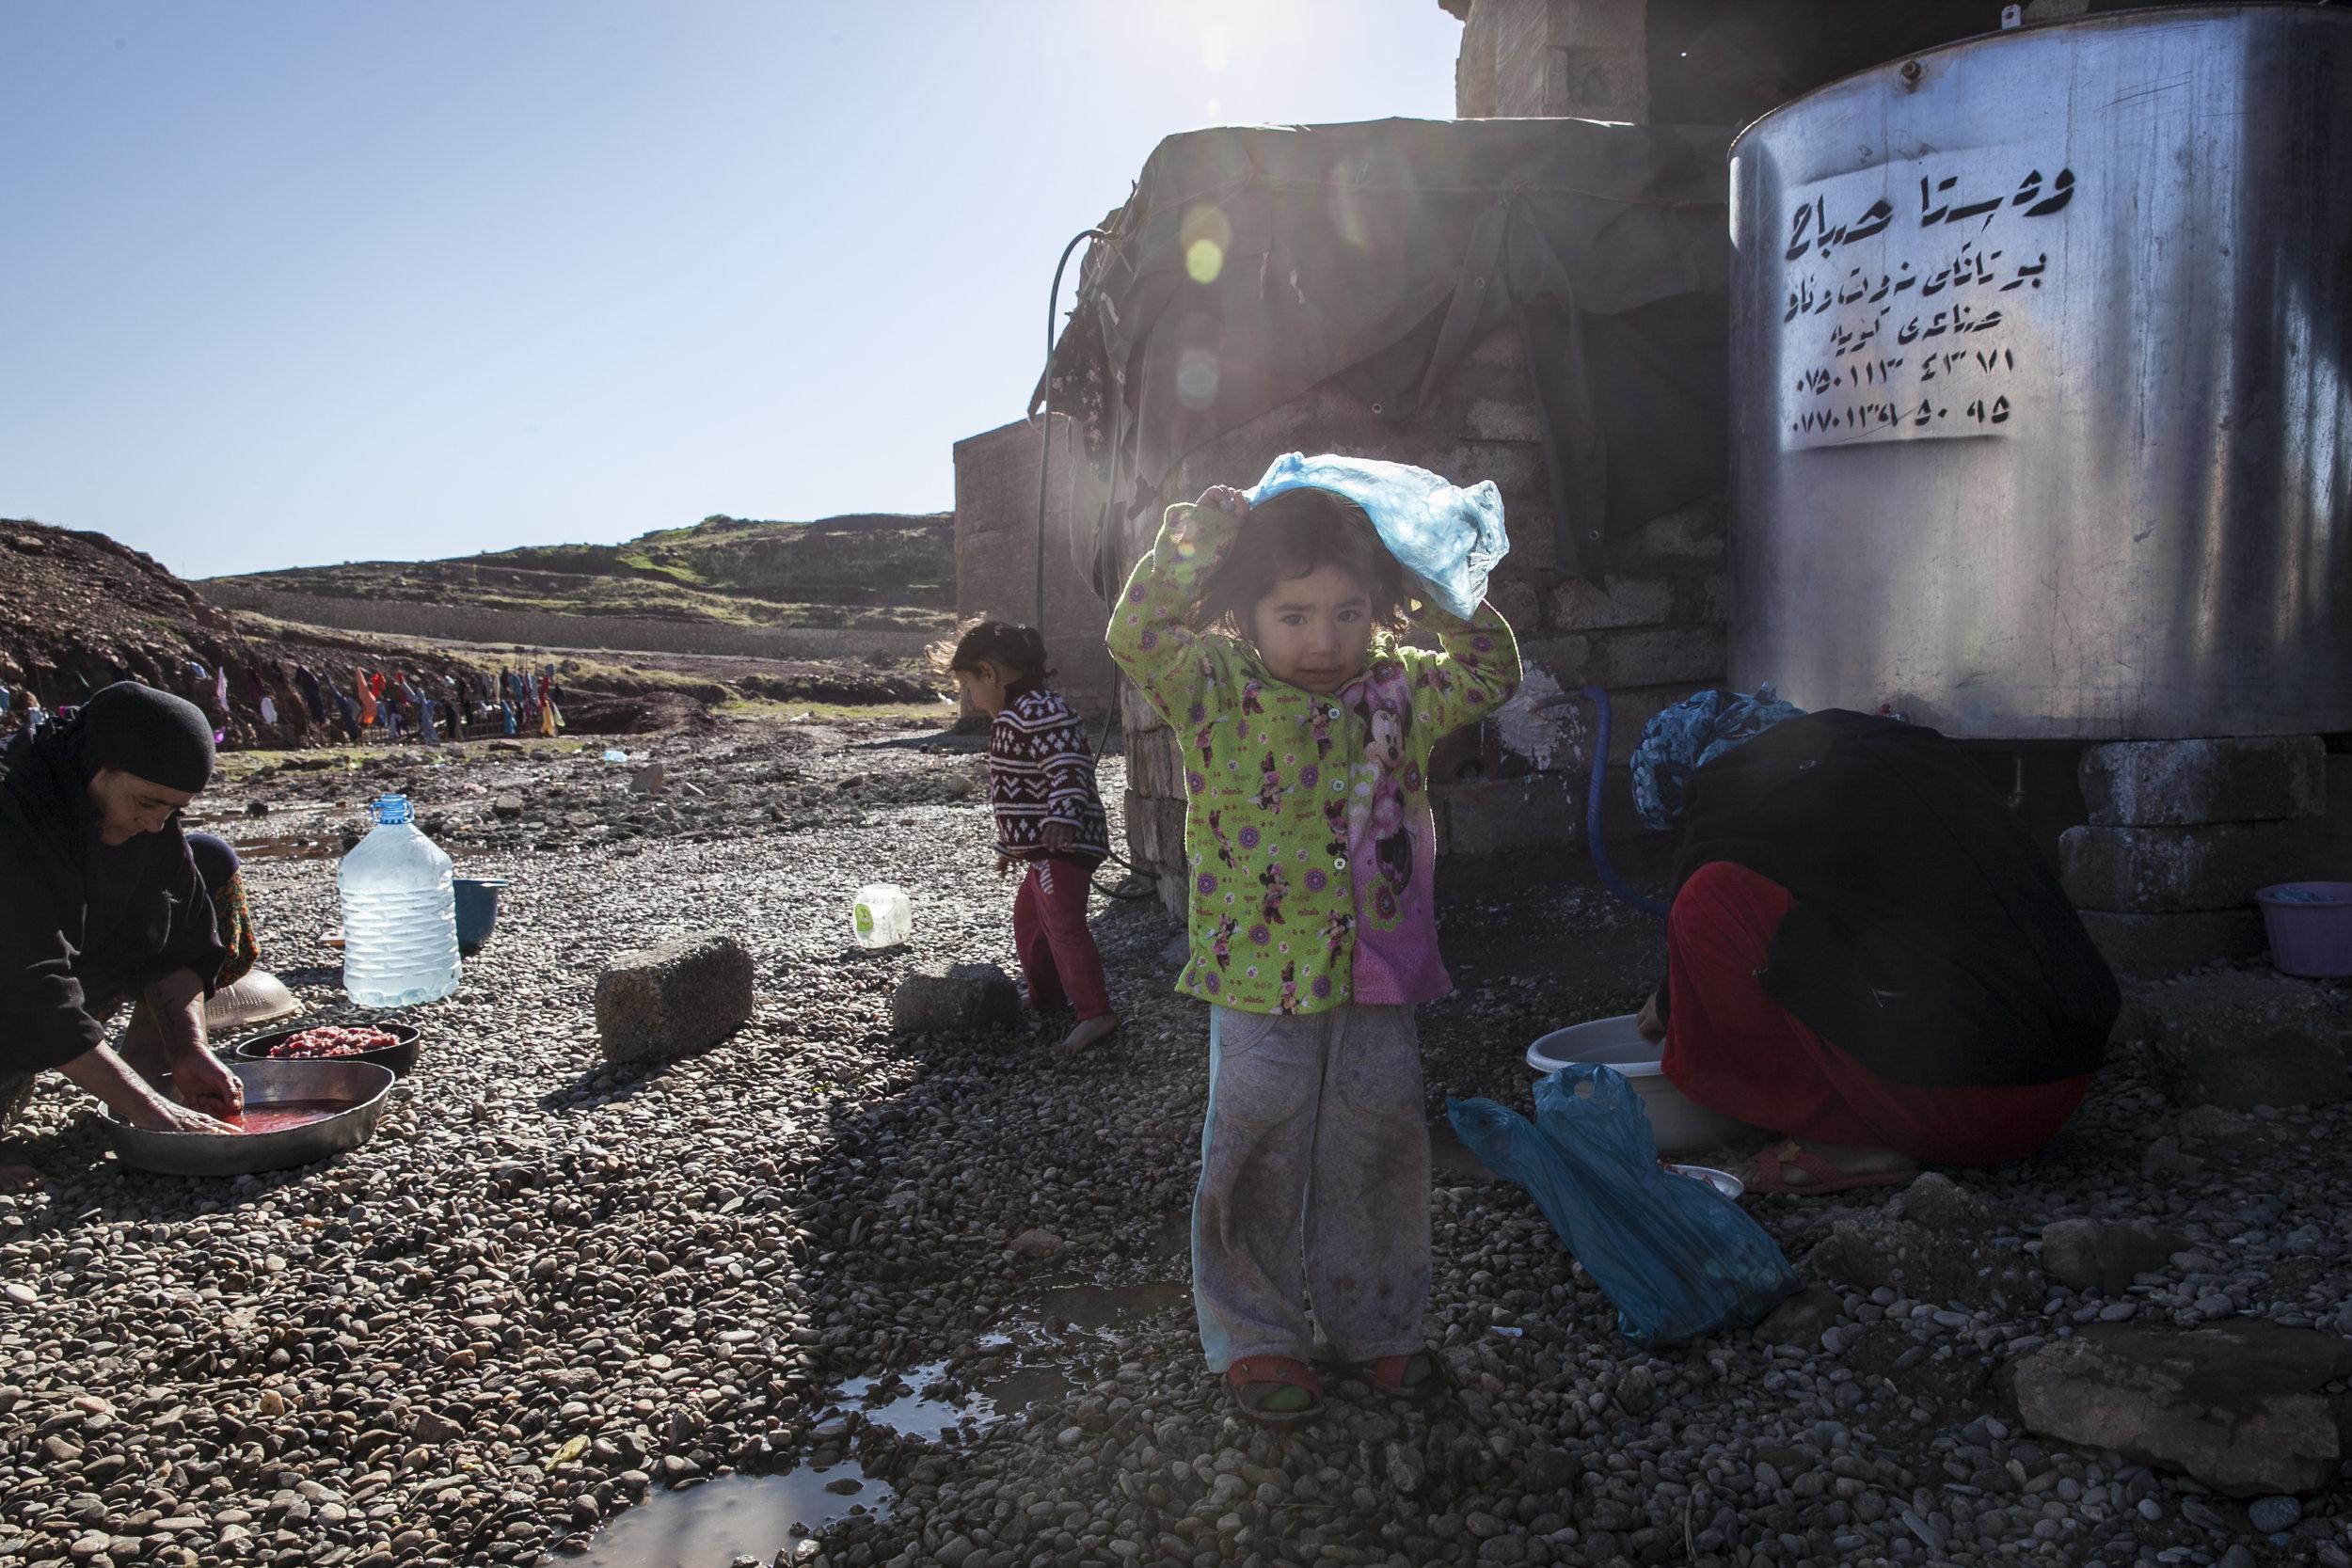 20141204_Refugees_GH_0002.jpg